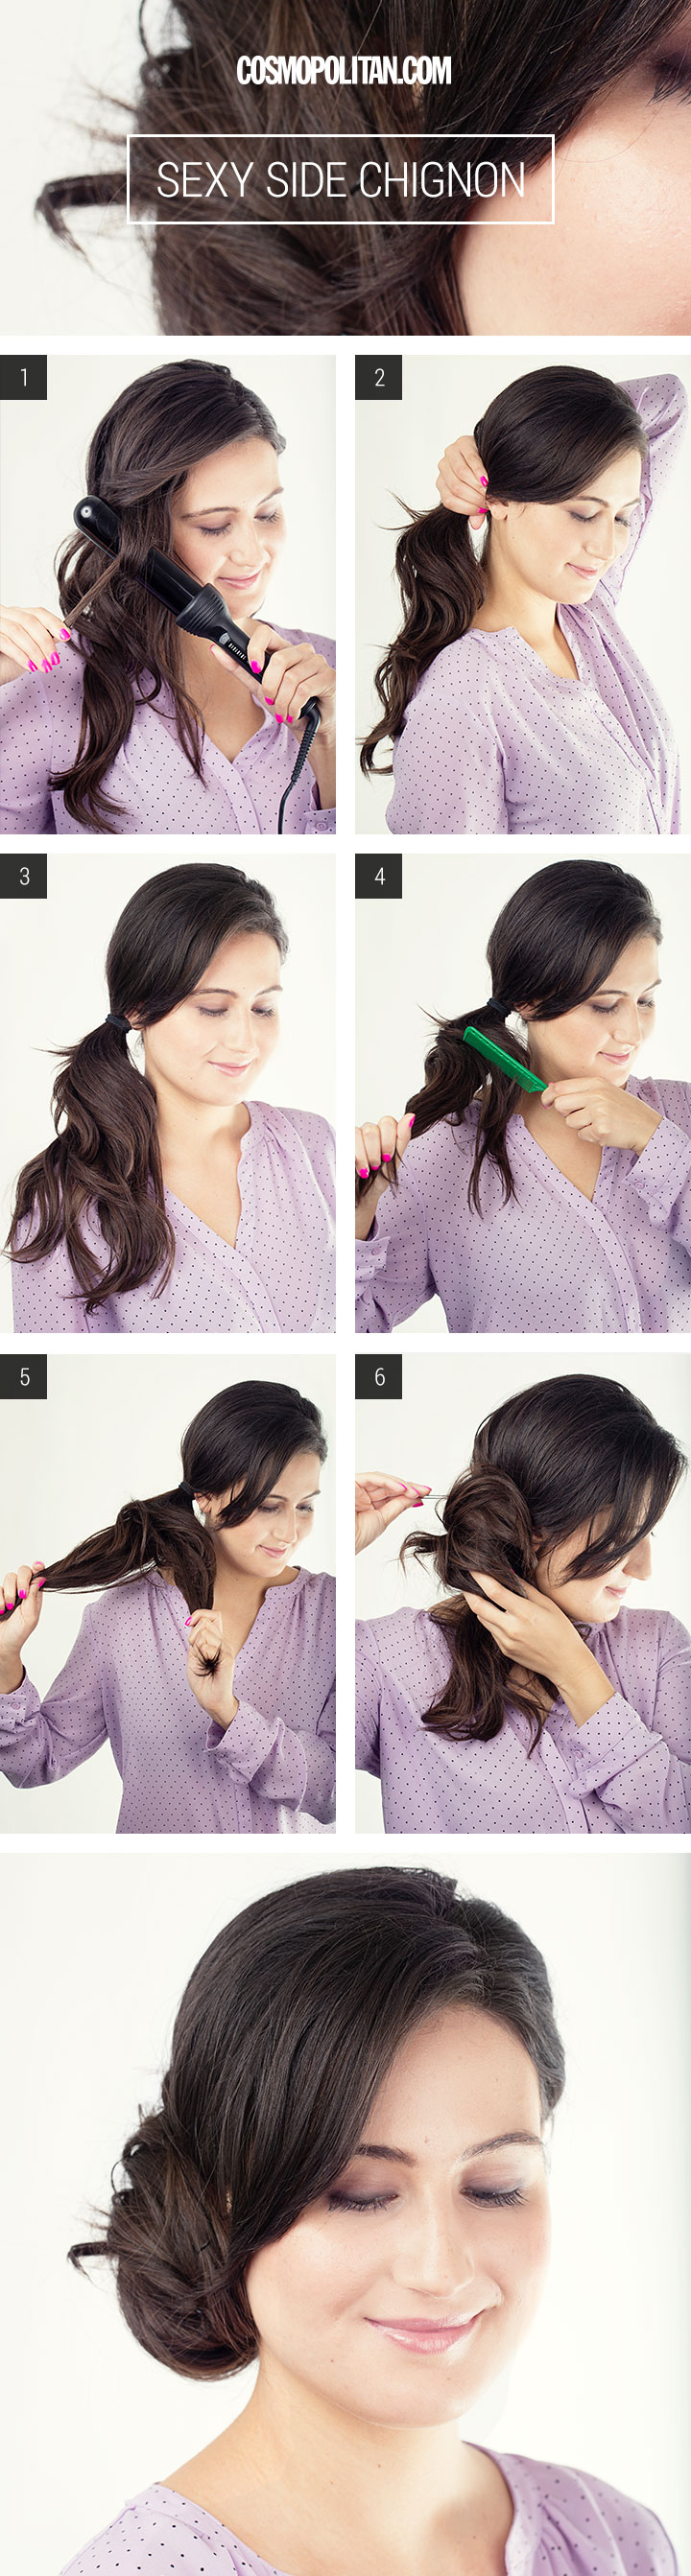 Strange Hair Tutorials 15 Simple Easy Hairstyles You Should Not Miss Short Hairstyles Gunalazisus